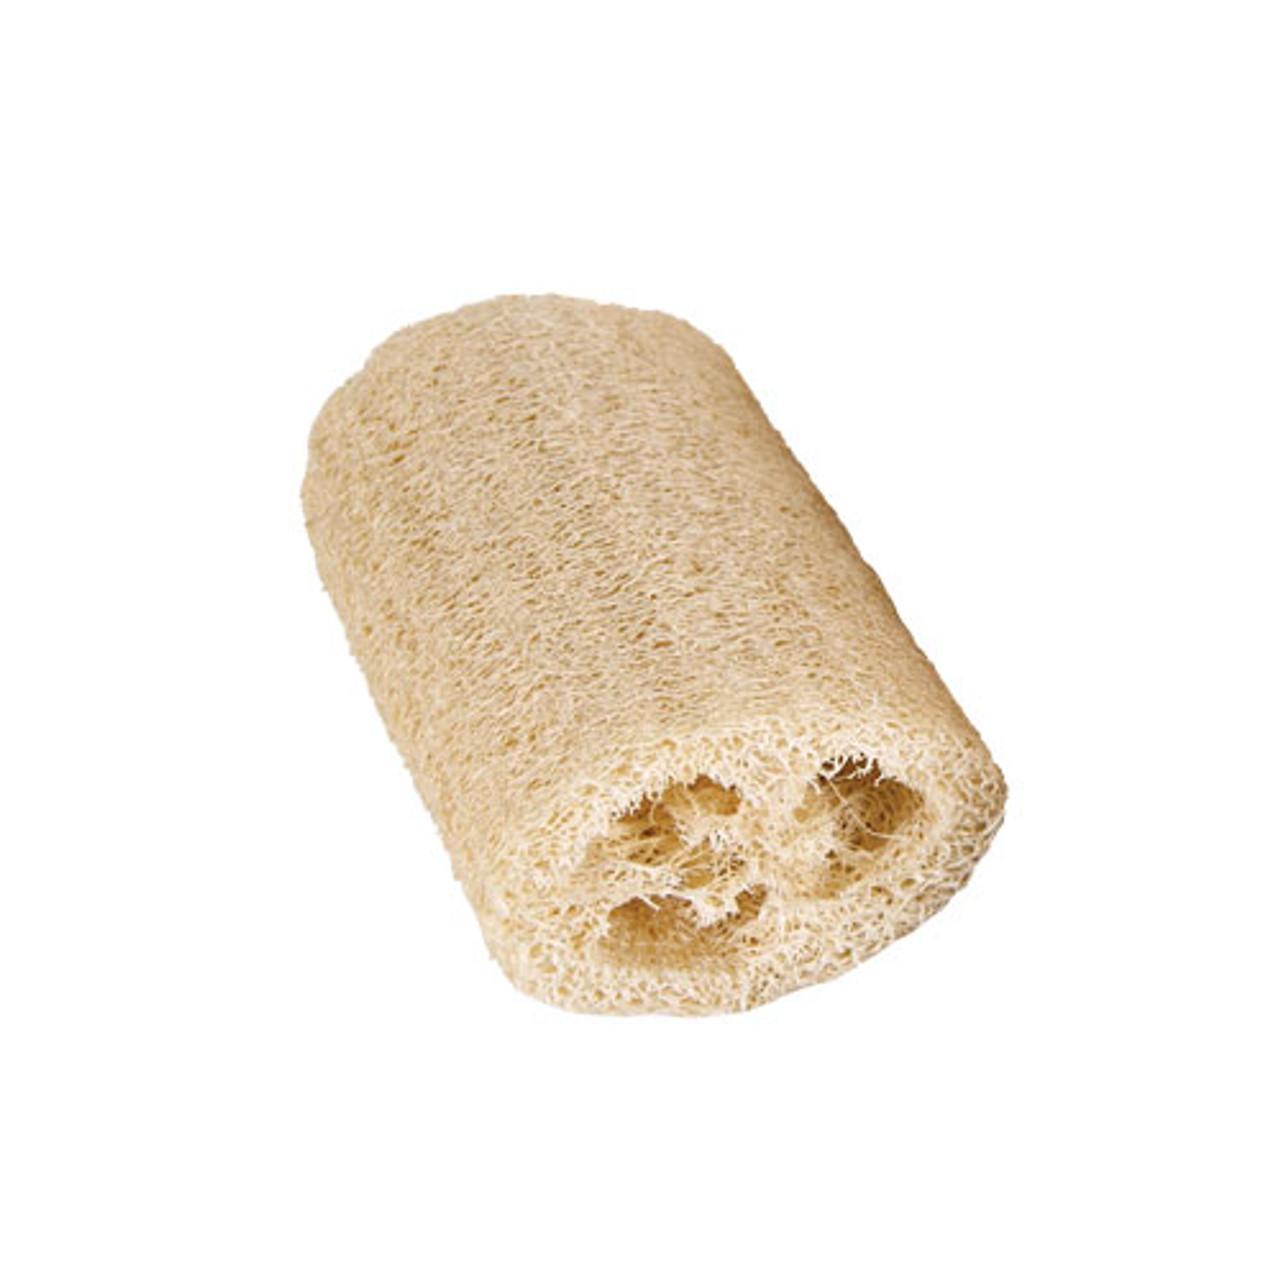 Whoa Ultra Exfoliating Loofah Sponges Jade And Pearl